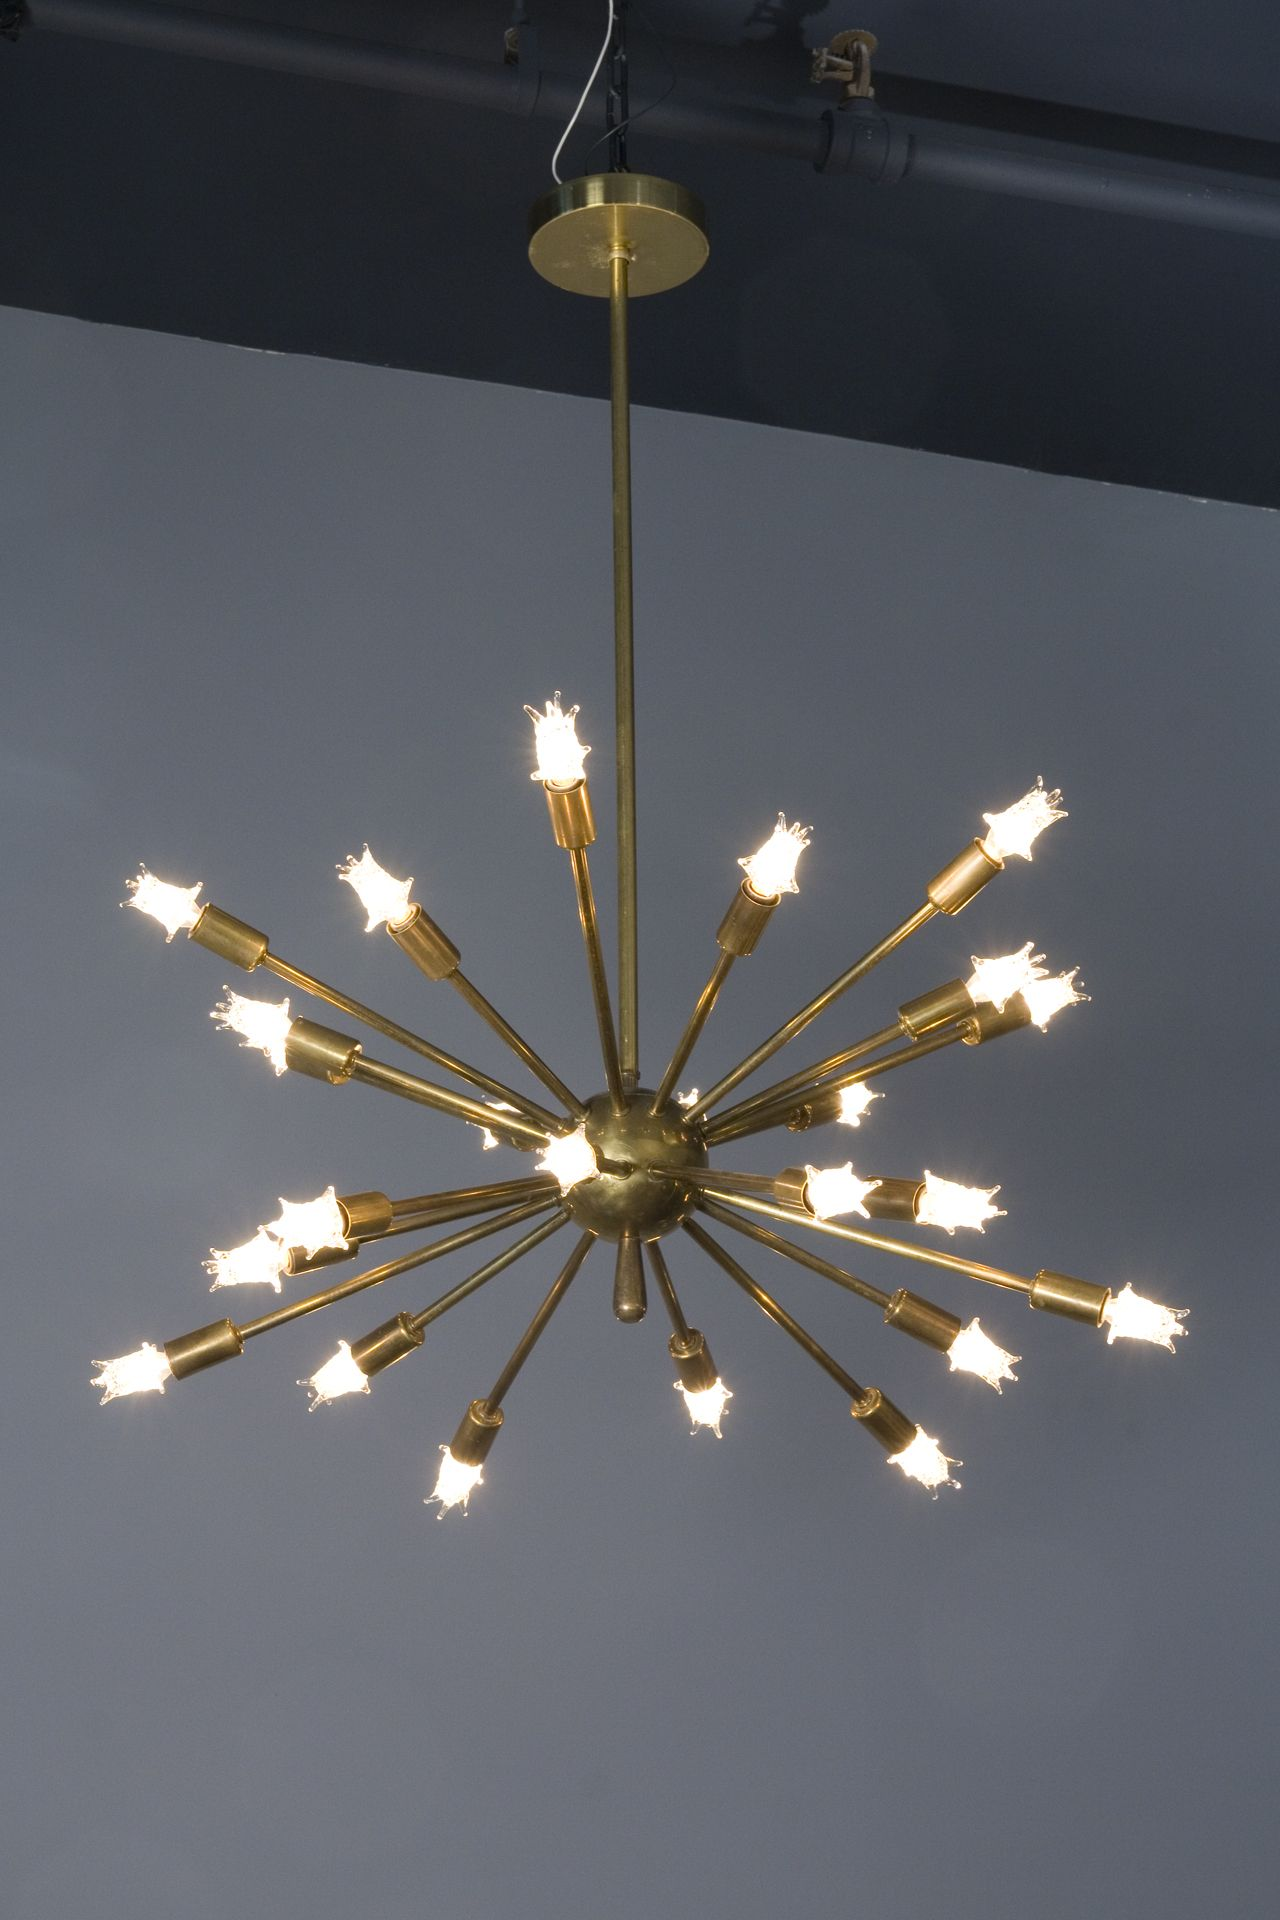 Vintage brass sputnik light fixture with correct starlight bulbs vintage brass sputnik light fixture with correct starlight bulbs arubaitofo Choice Image